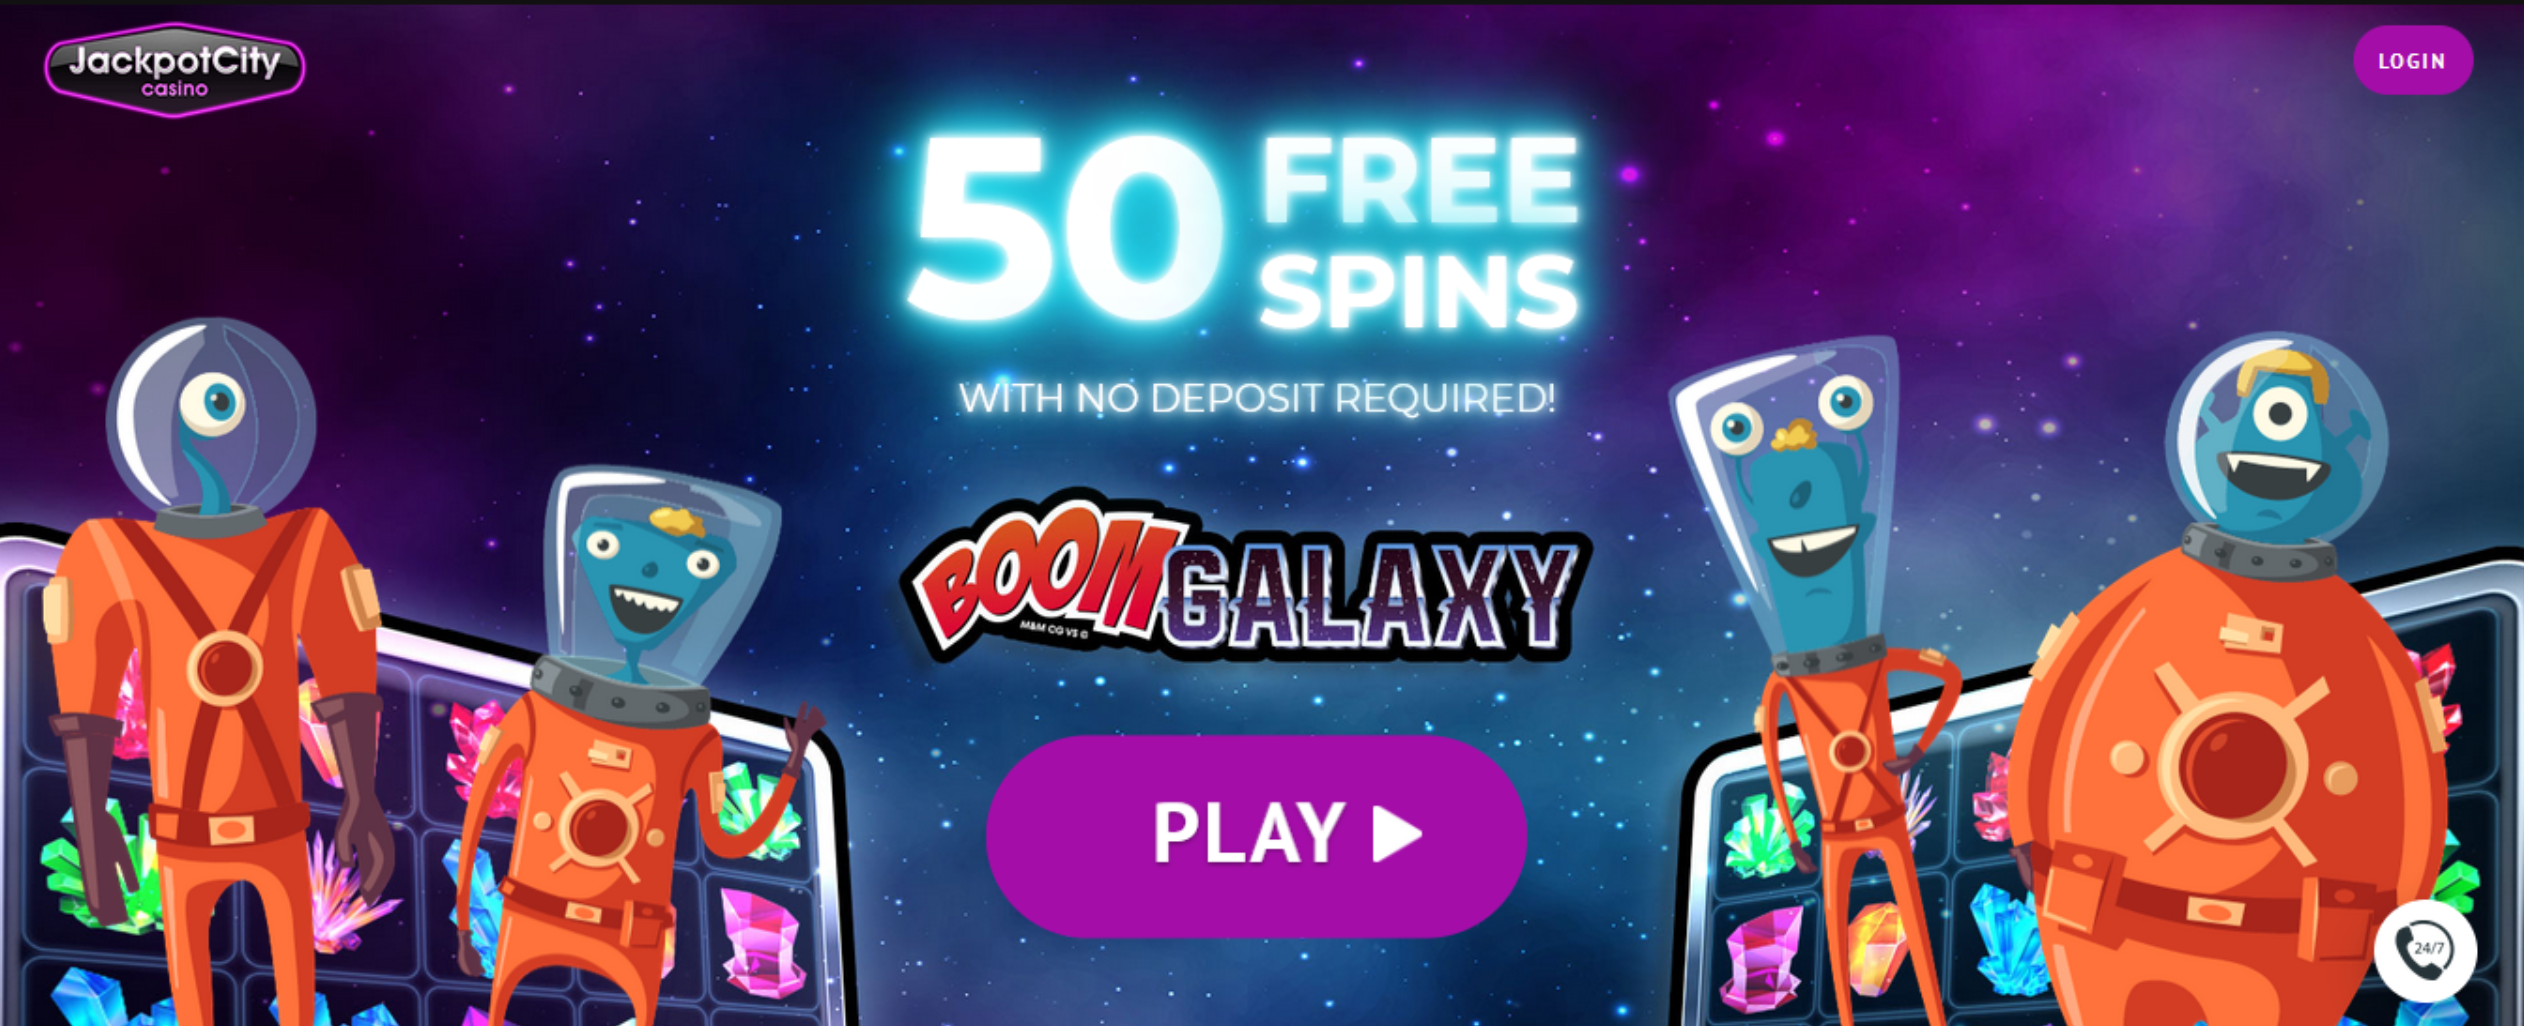 No Deposit Bonus Canada - Jackpot City Casino